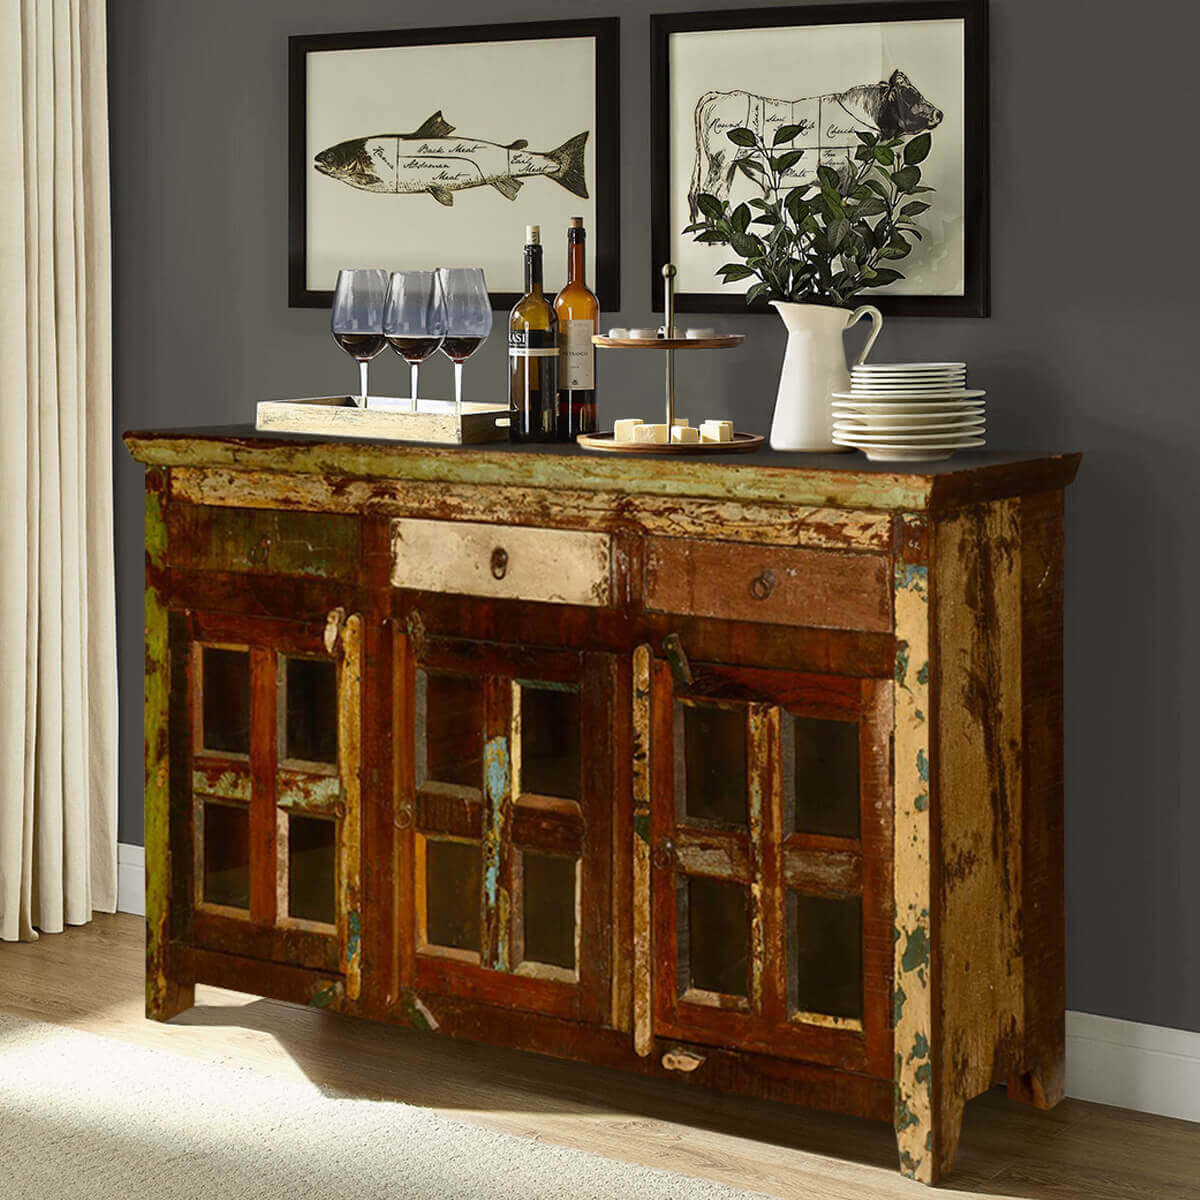 Appalachian Rustic Reclaimed Wood Window Pane Buffet